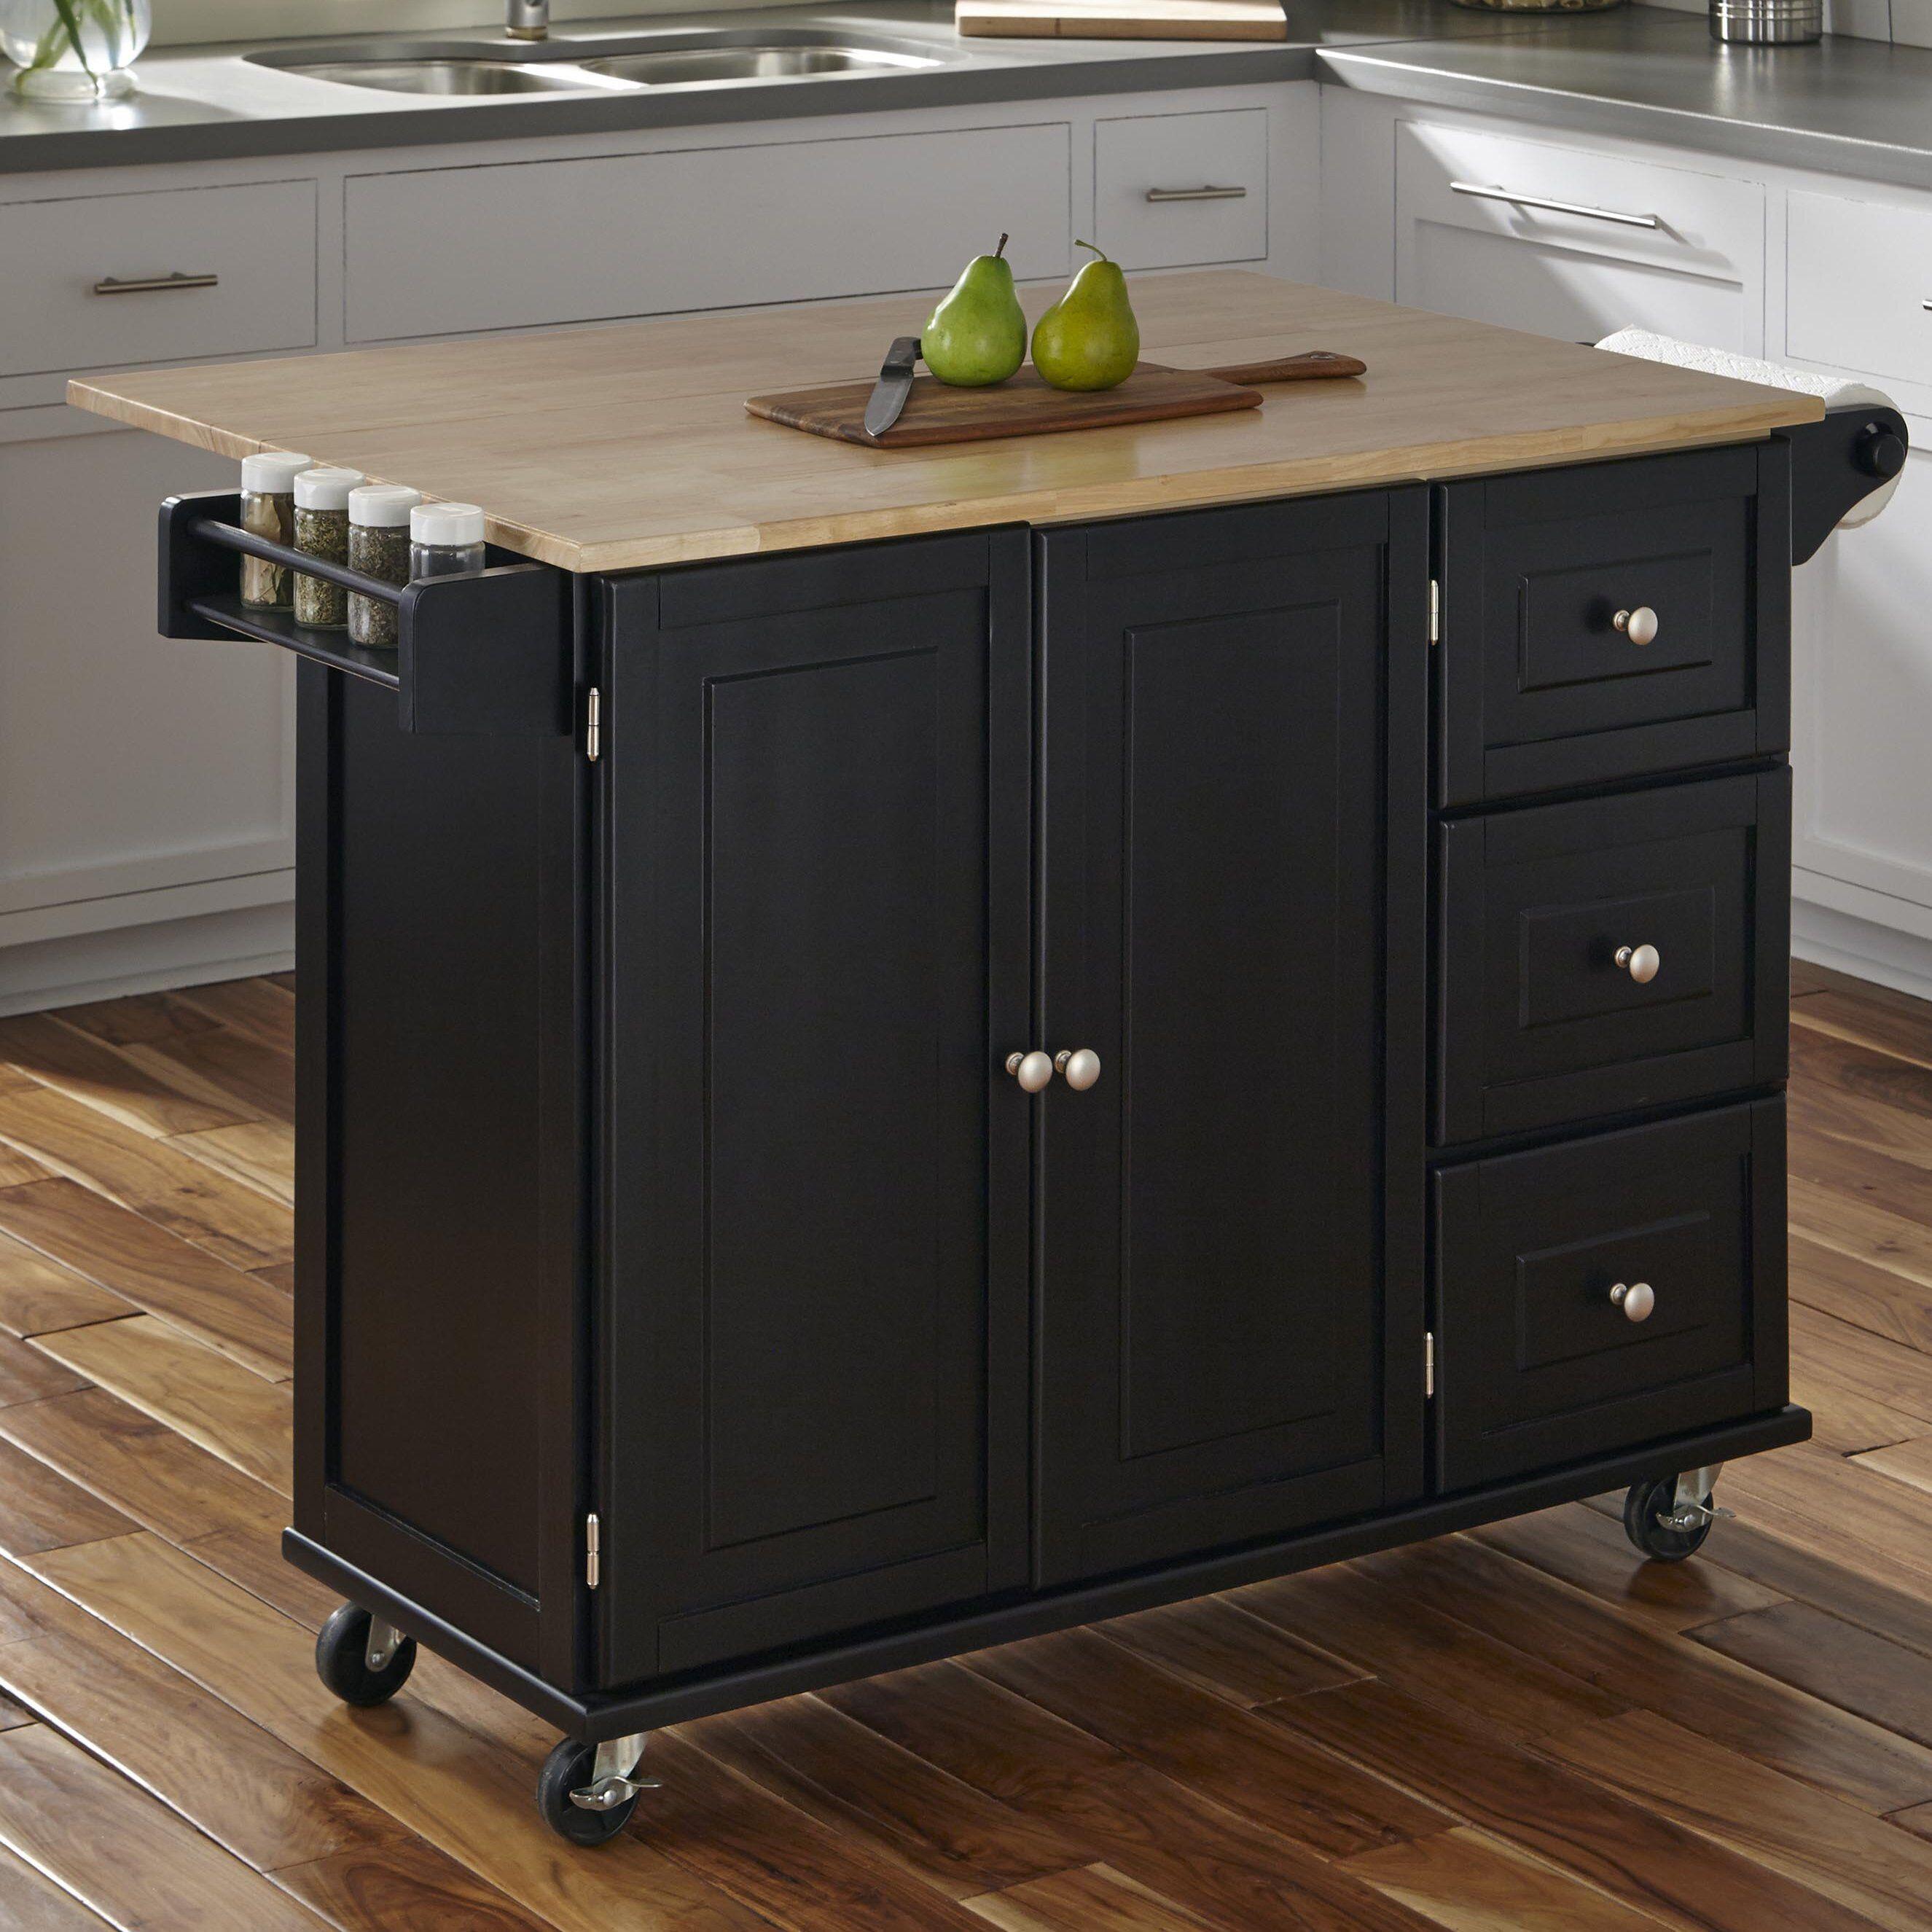 Kuhnhenn Kitchen Cart With Wood Top Reviews Birch Lane Kitchen Cart Kitchen Remodel Kitchen Countertops